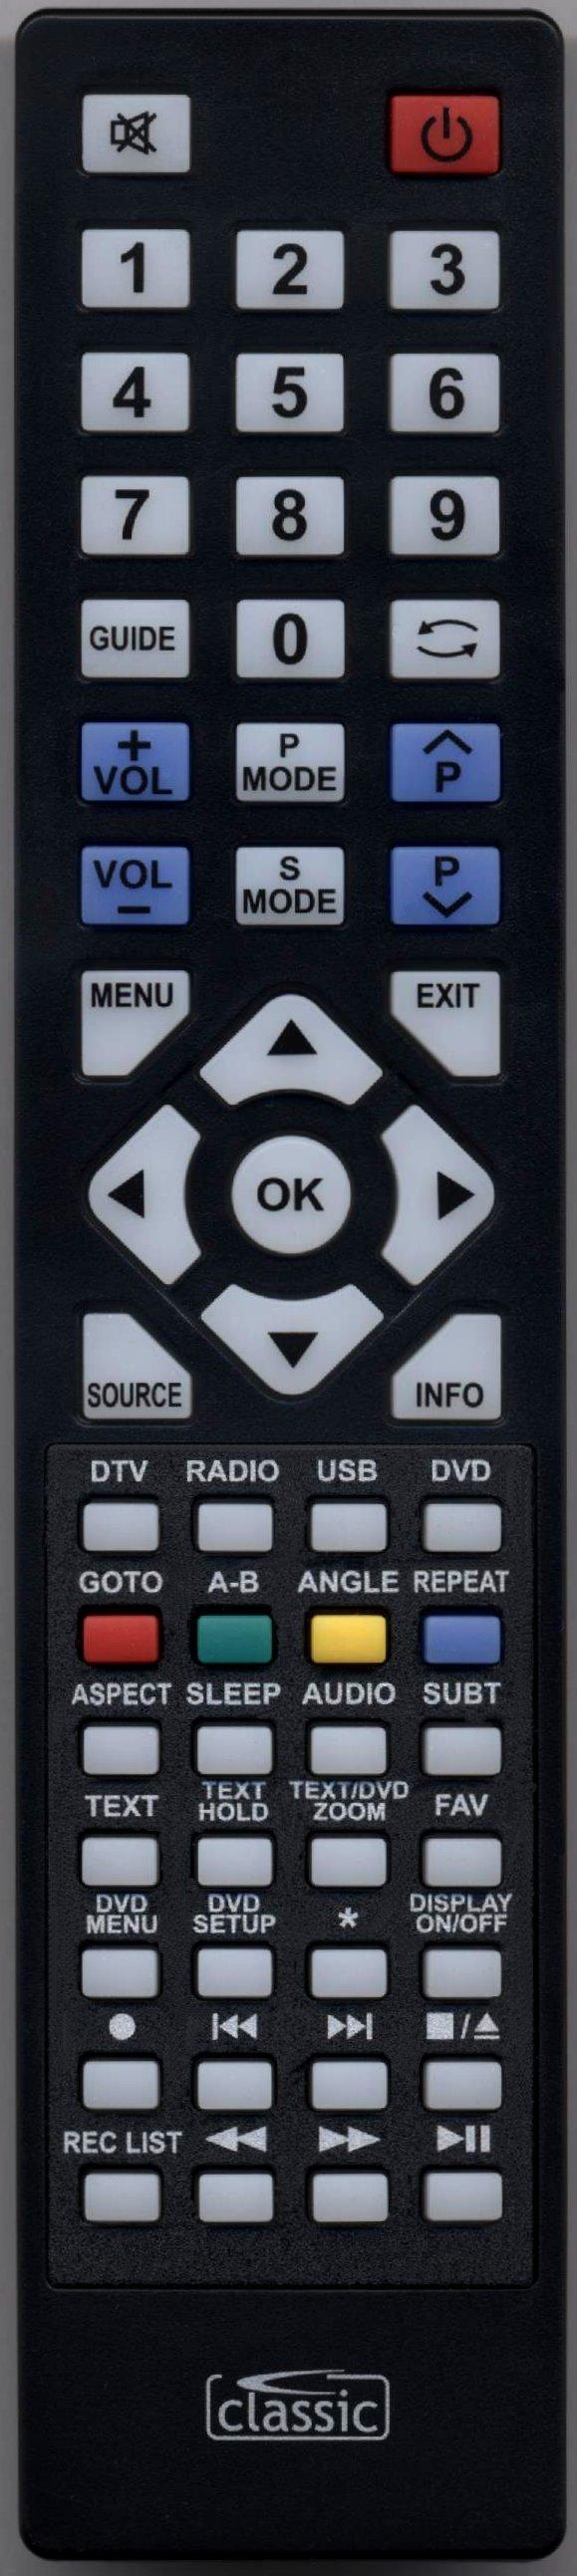 BLAUPUNKT 48/148O-GB-11B-FEGP-UK Remote Control Alternative